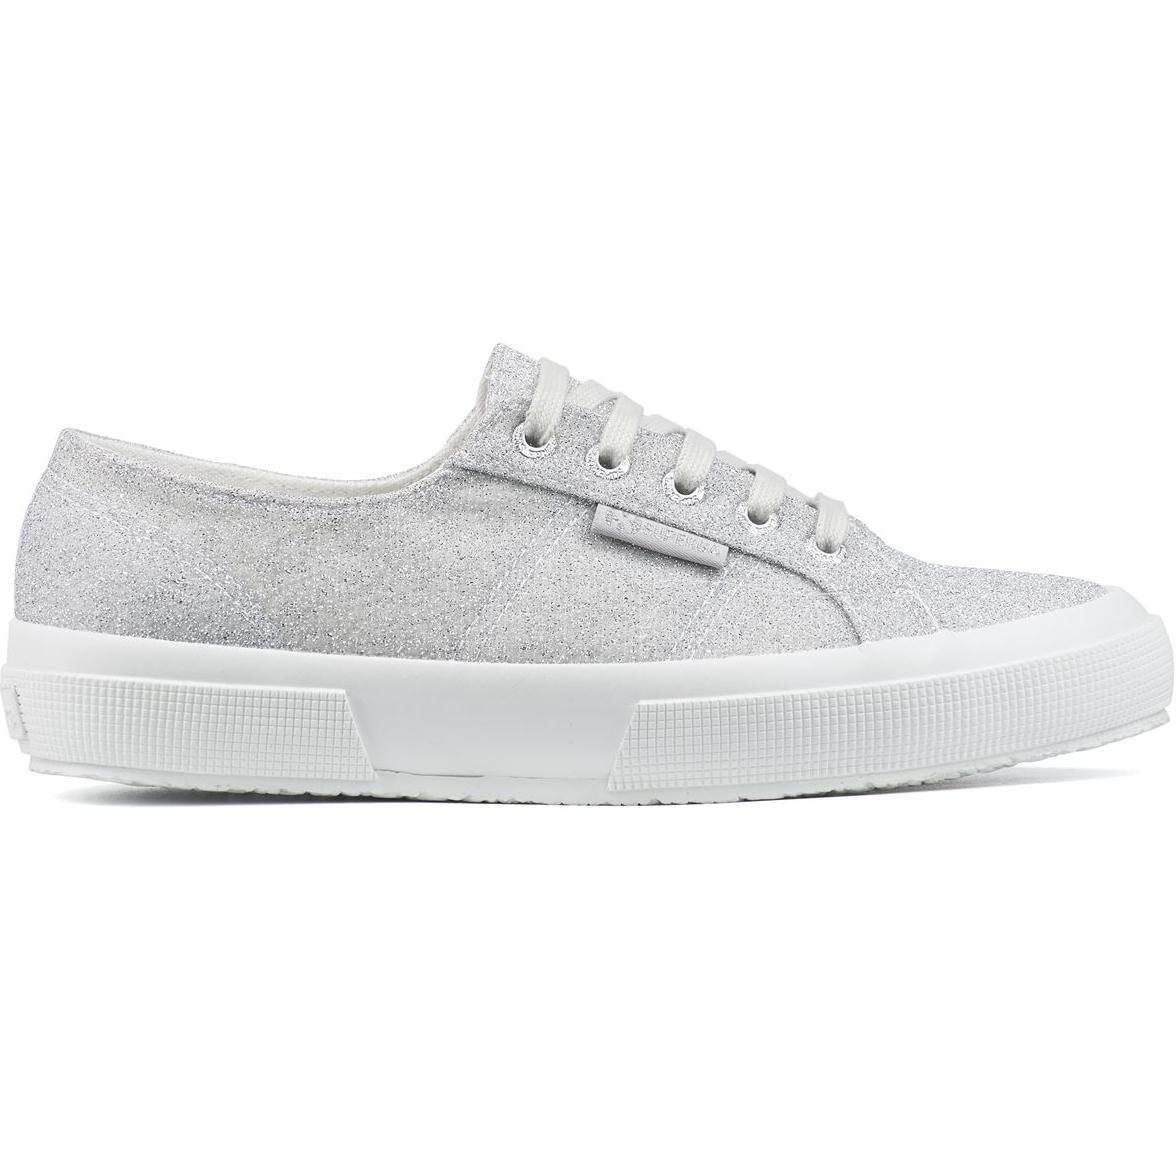 Superga 2790 Plateau Sneaker